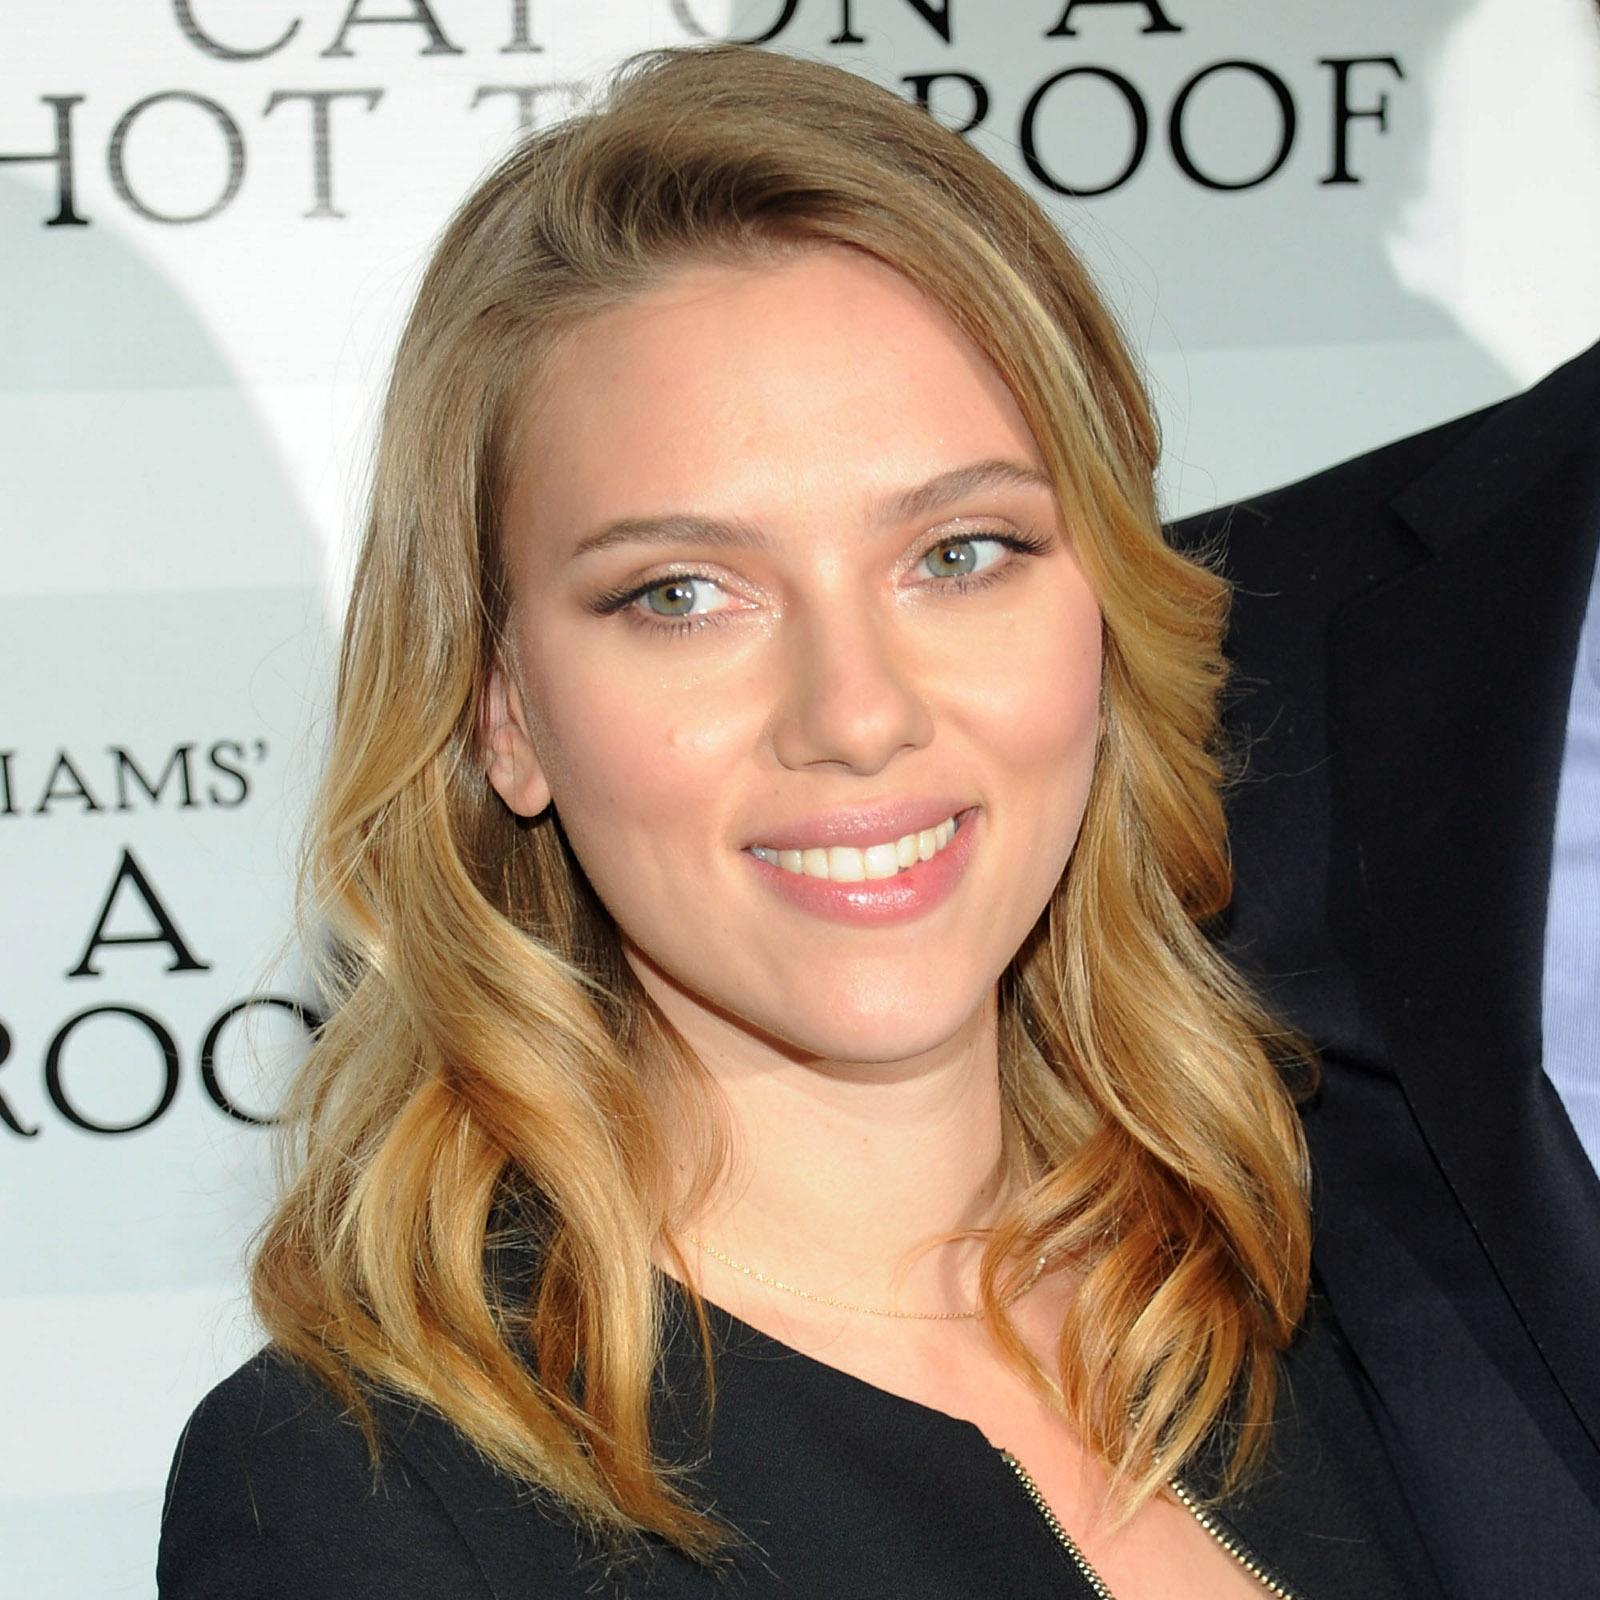 http://3.bp.blogspot.com/-gCGvBAl_o7Q/UP5TreUylyI/AAAAAAAAXZs/CmQlgFkvaNs/s1600/Scarlett-Johansson.jpg